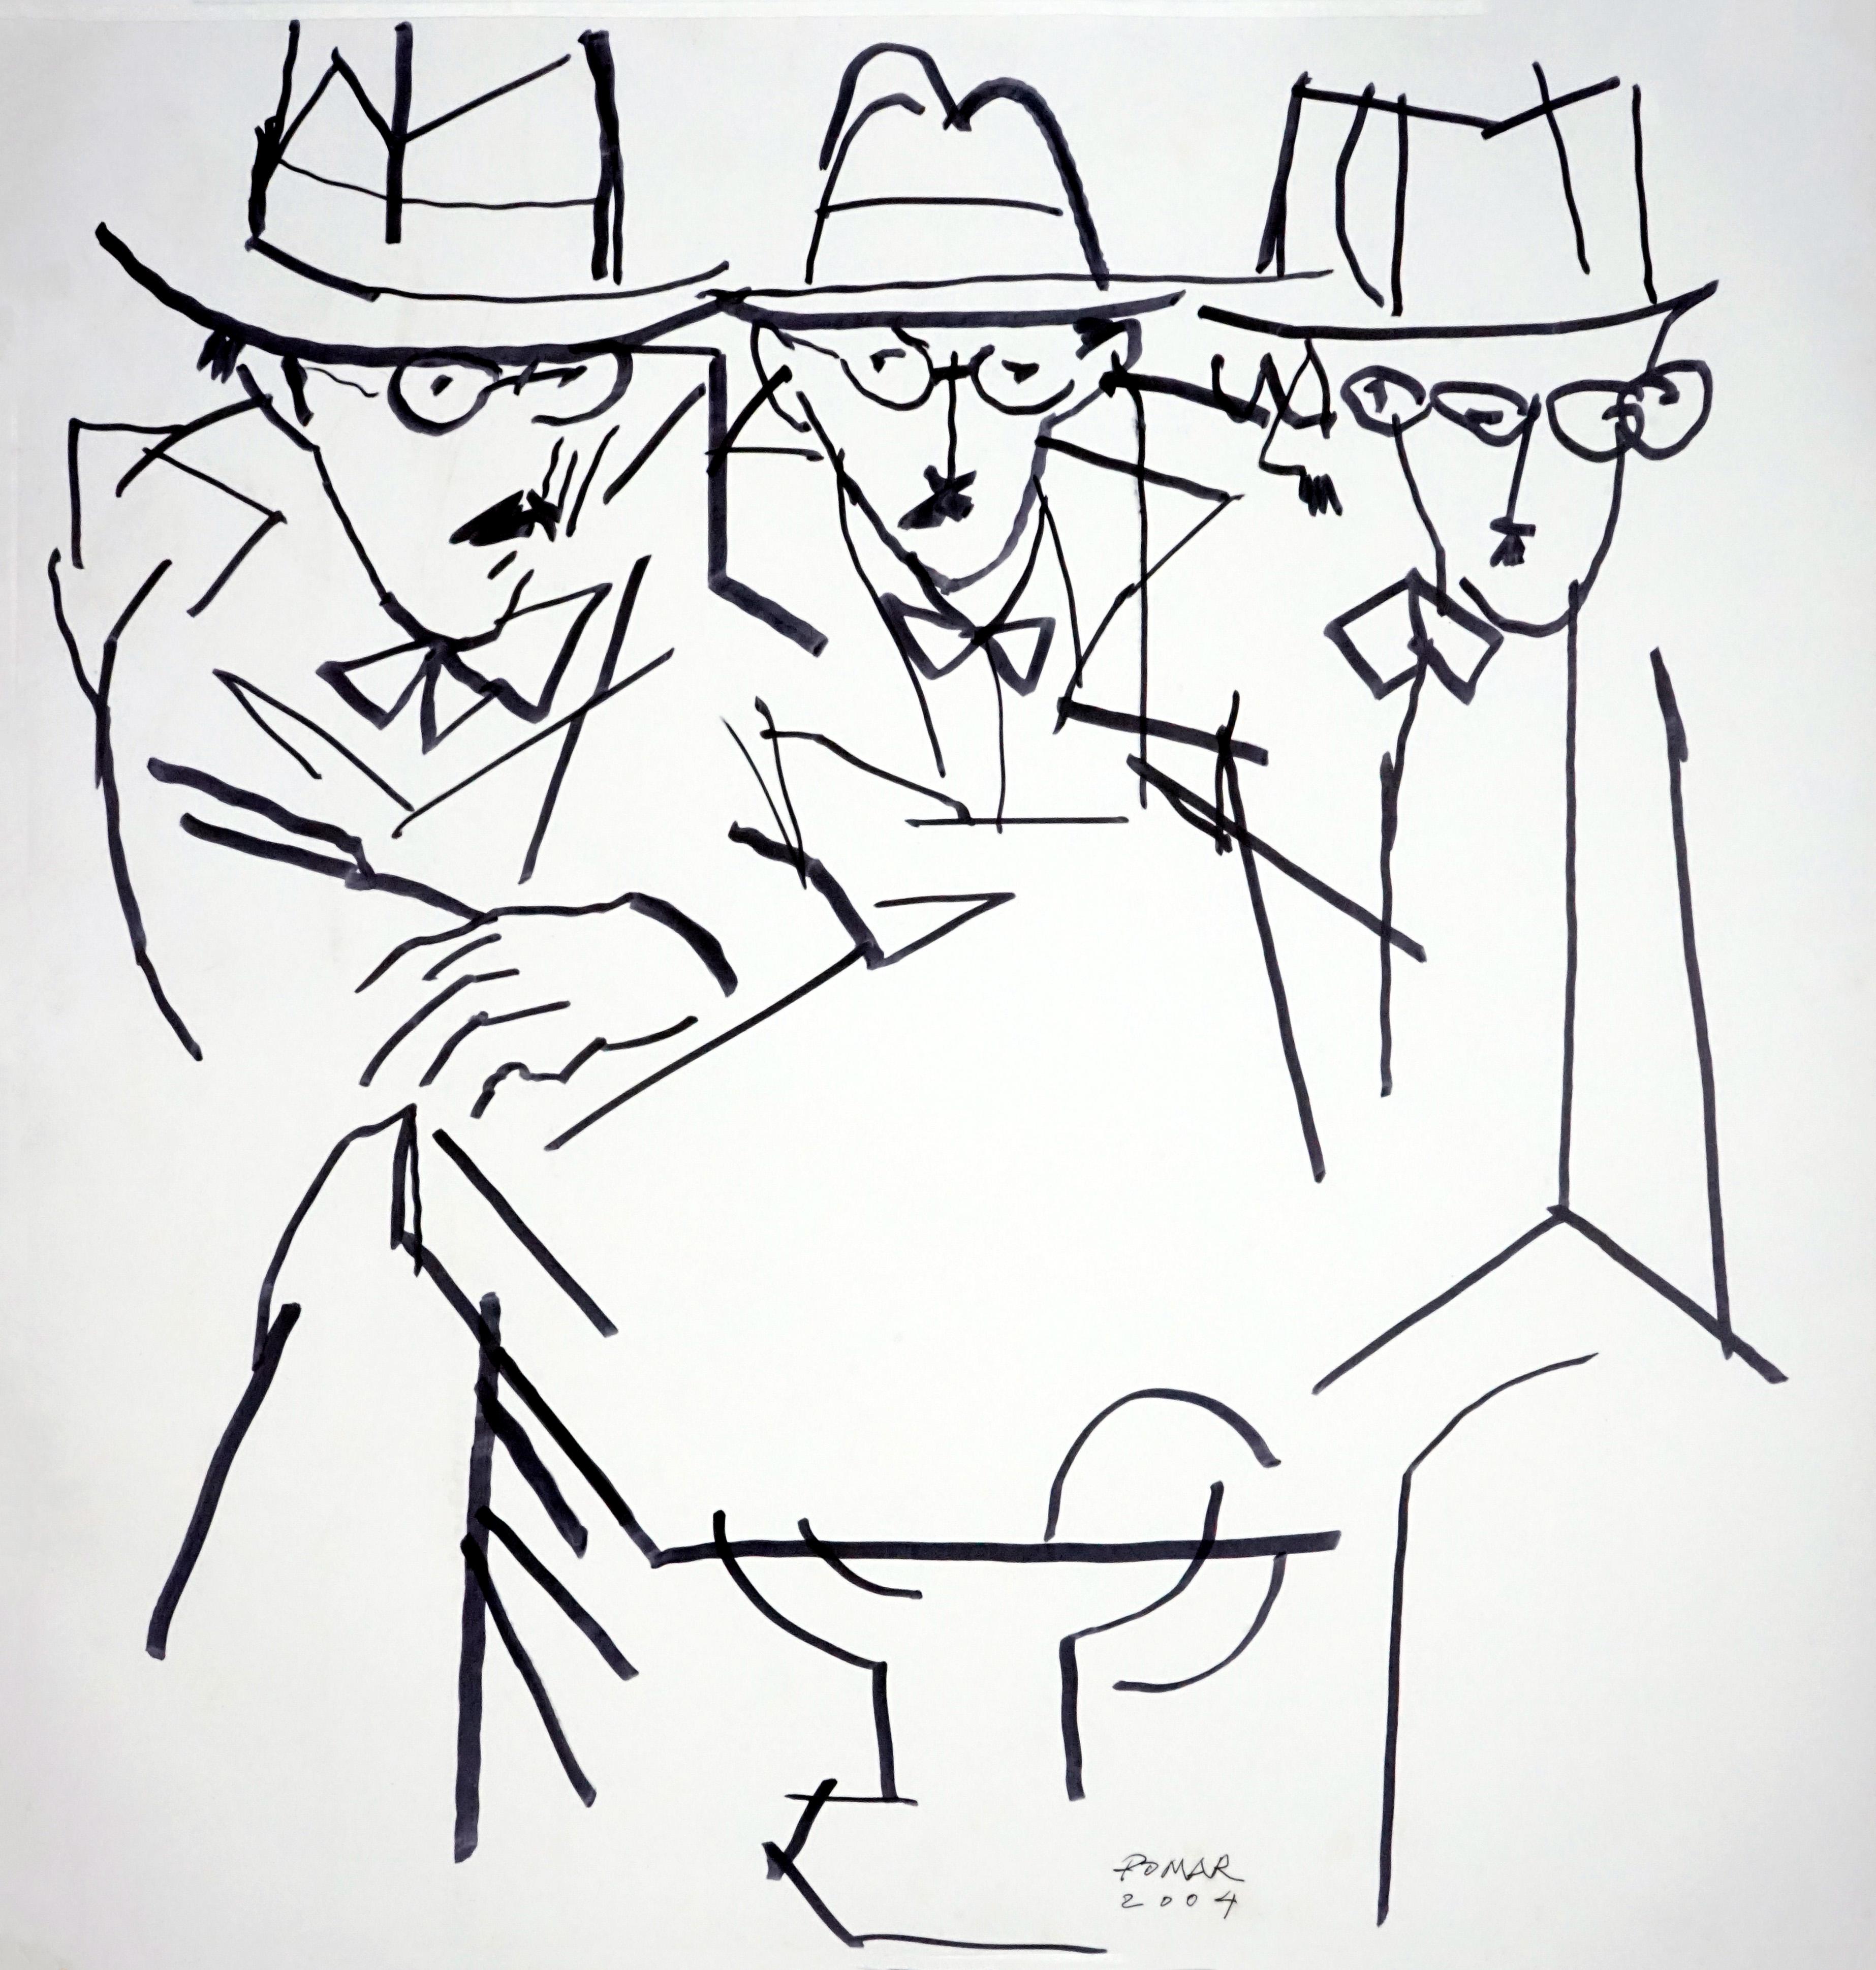 feira-desenho-lisboa-drawing-room-2019-fernando-pessoa-julio-pomar